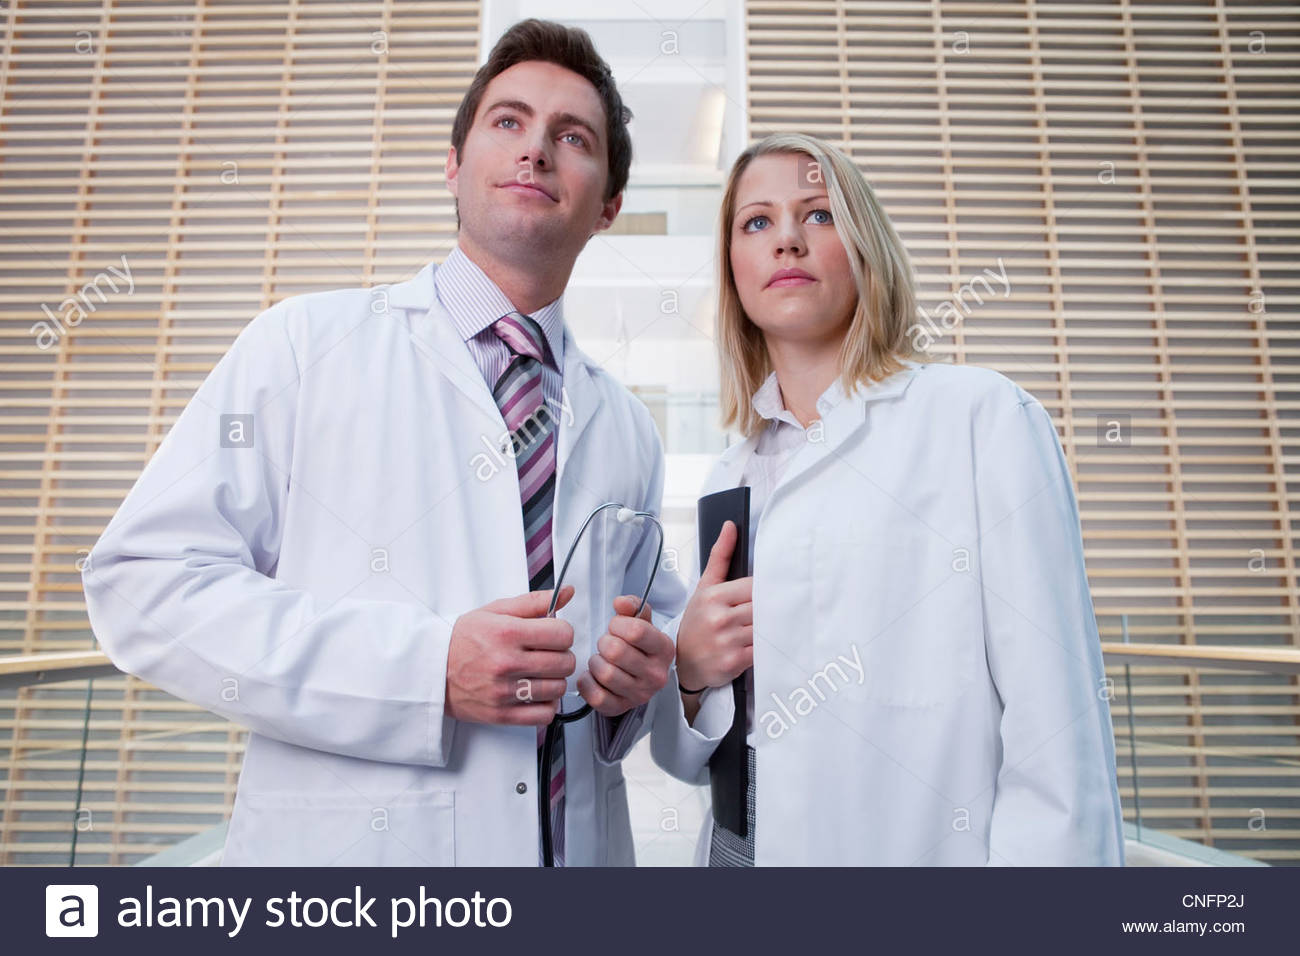 Portrait of serious doctors wearing lab coats in hospital corridor - Stock Image